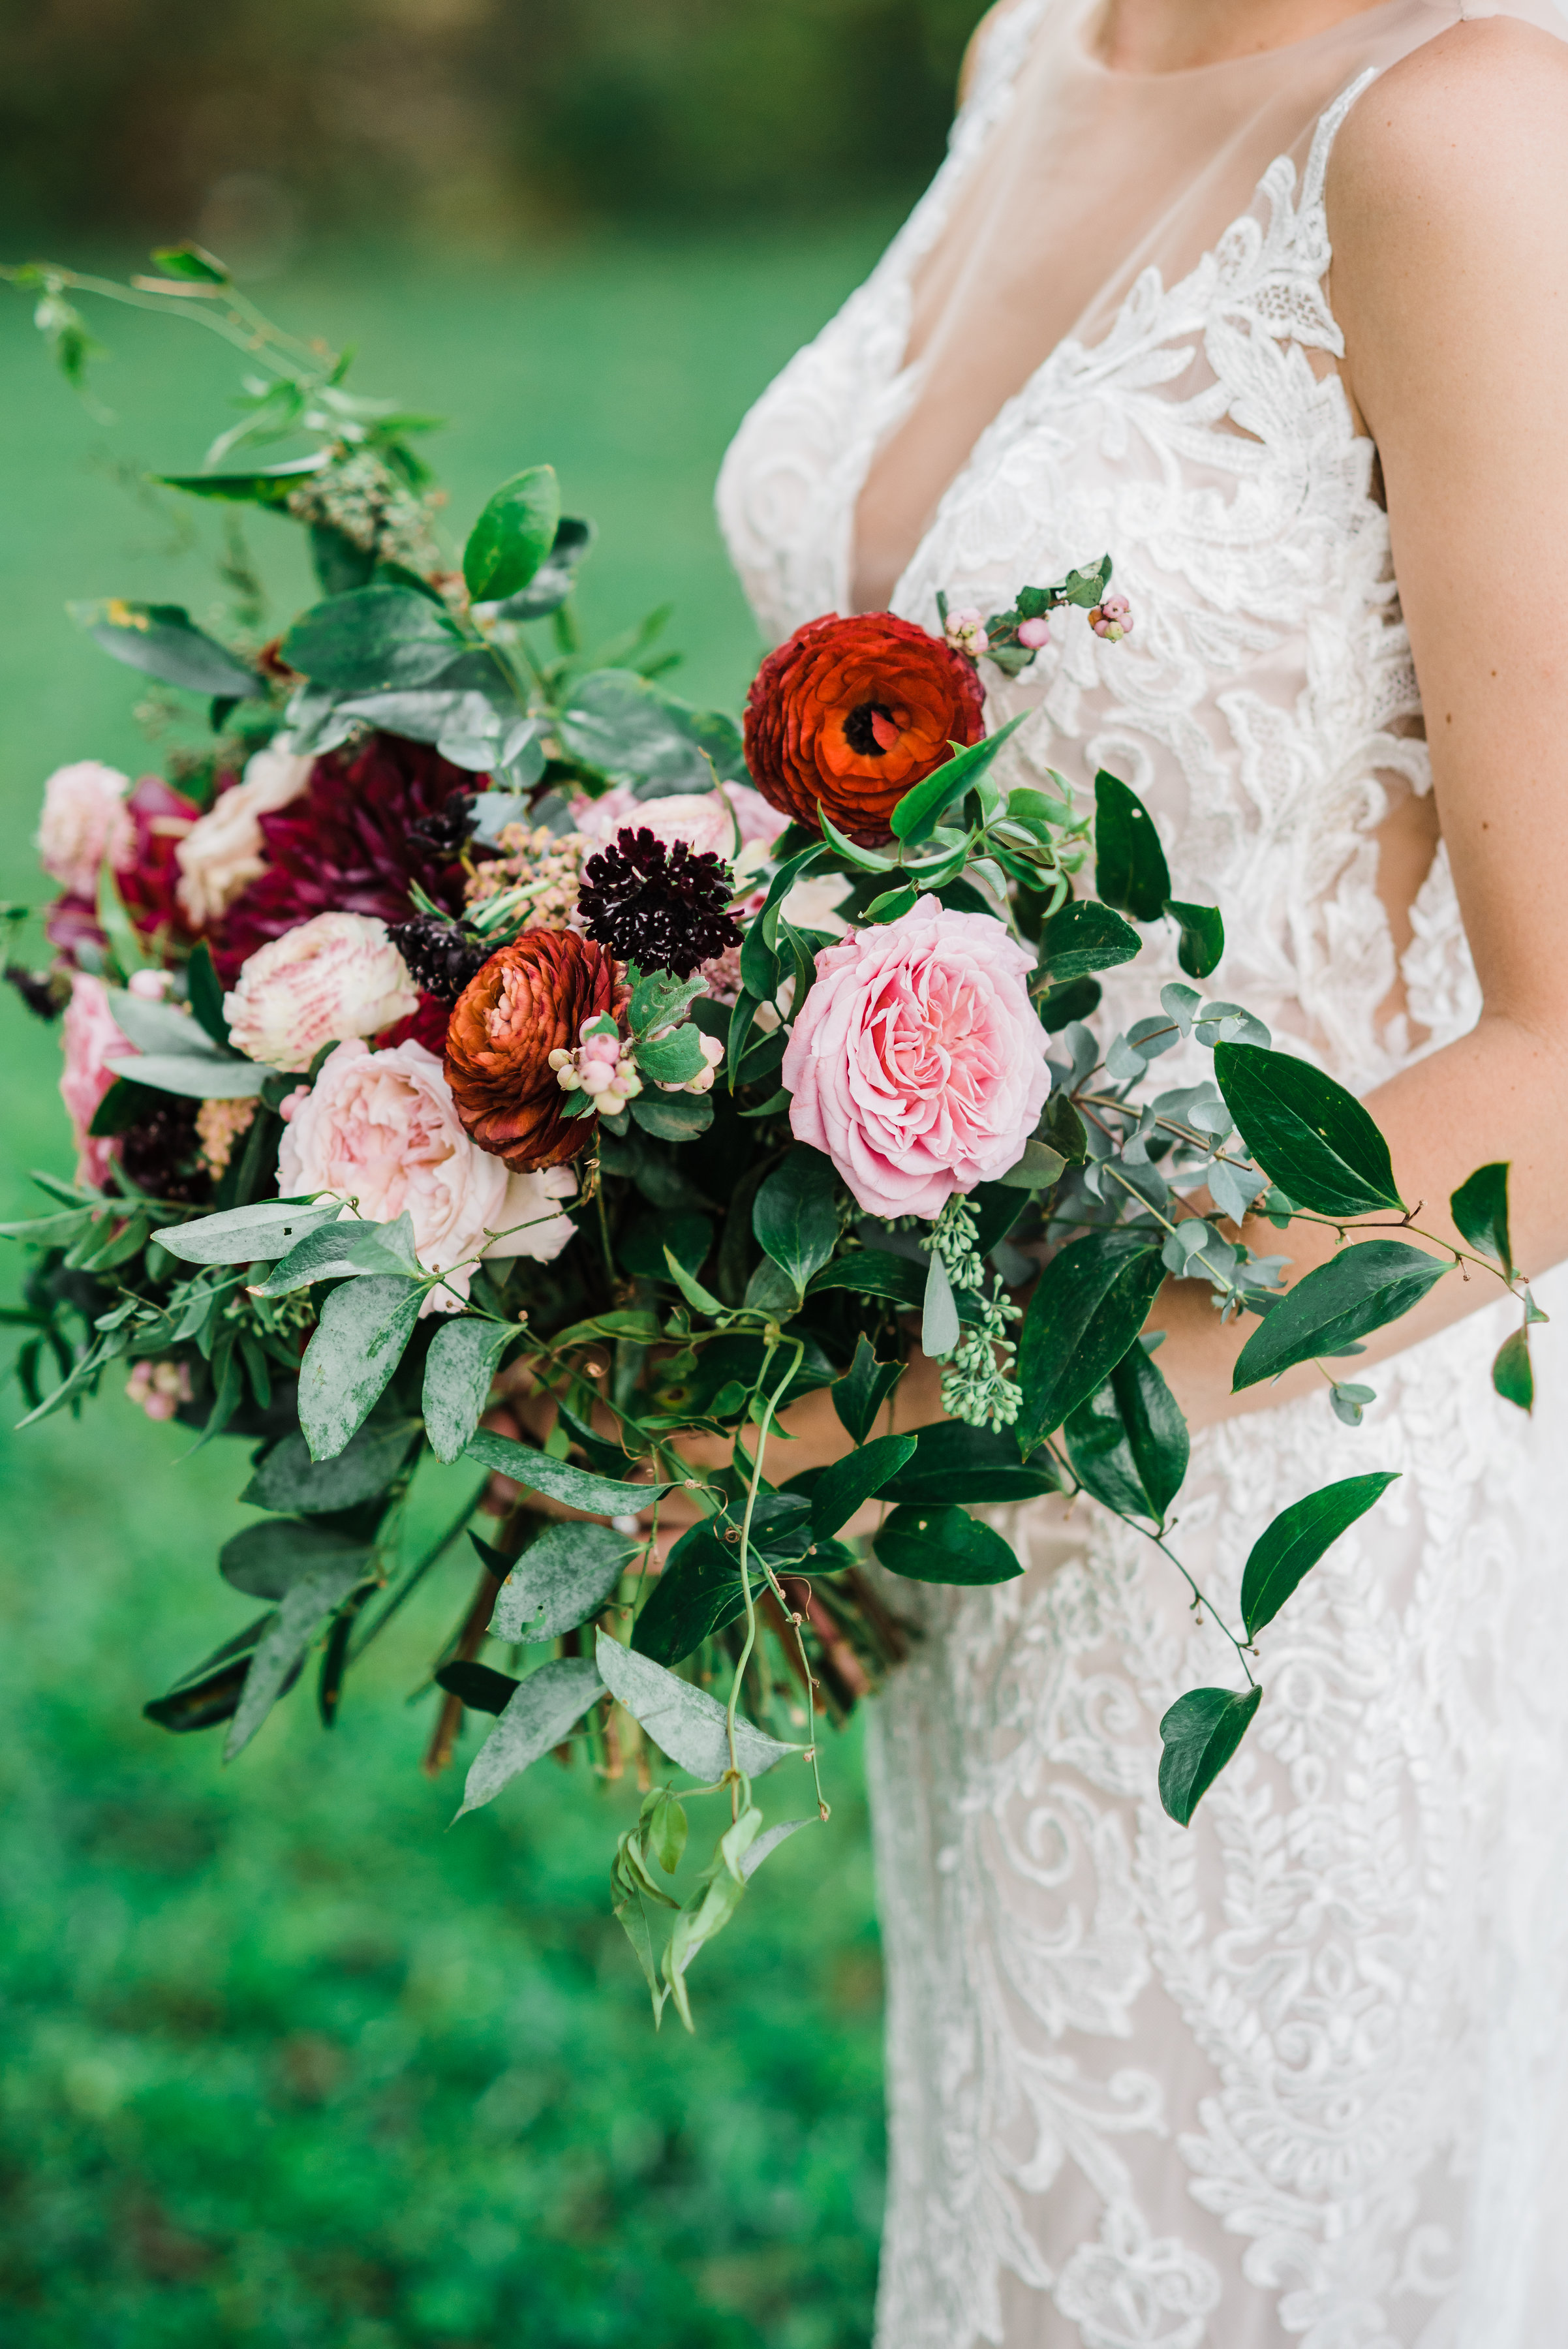 Ombre marsala bridal bouquet with dahlias, garden roses, and ranunculus // Nashville Wedding Florist